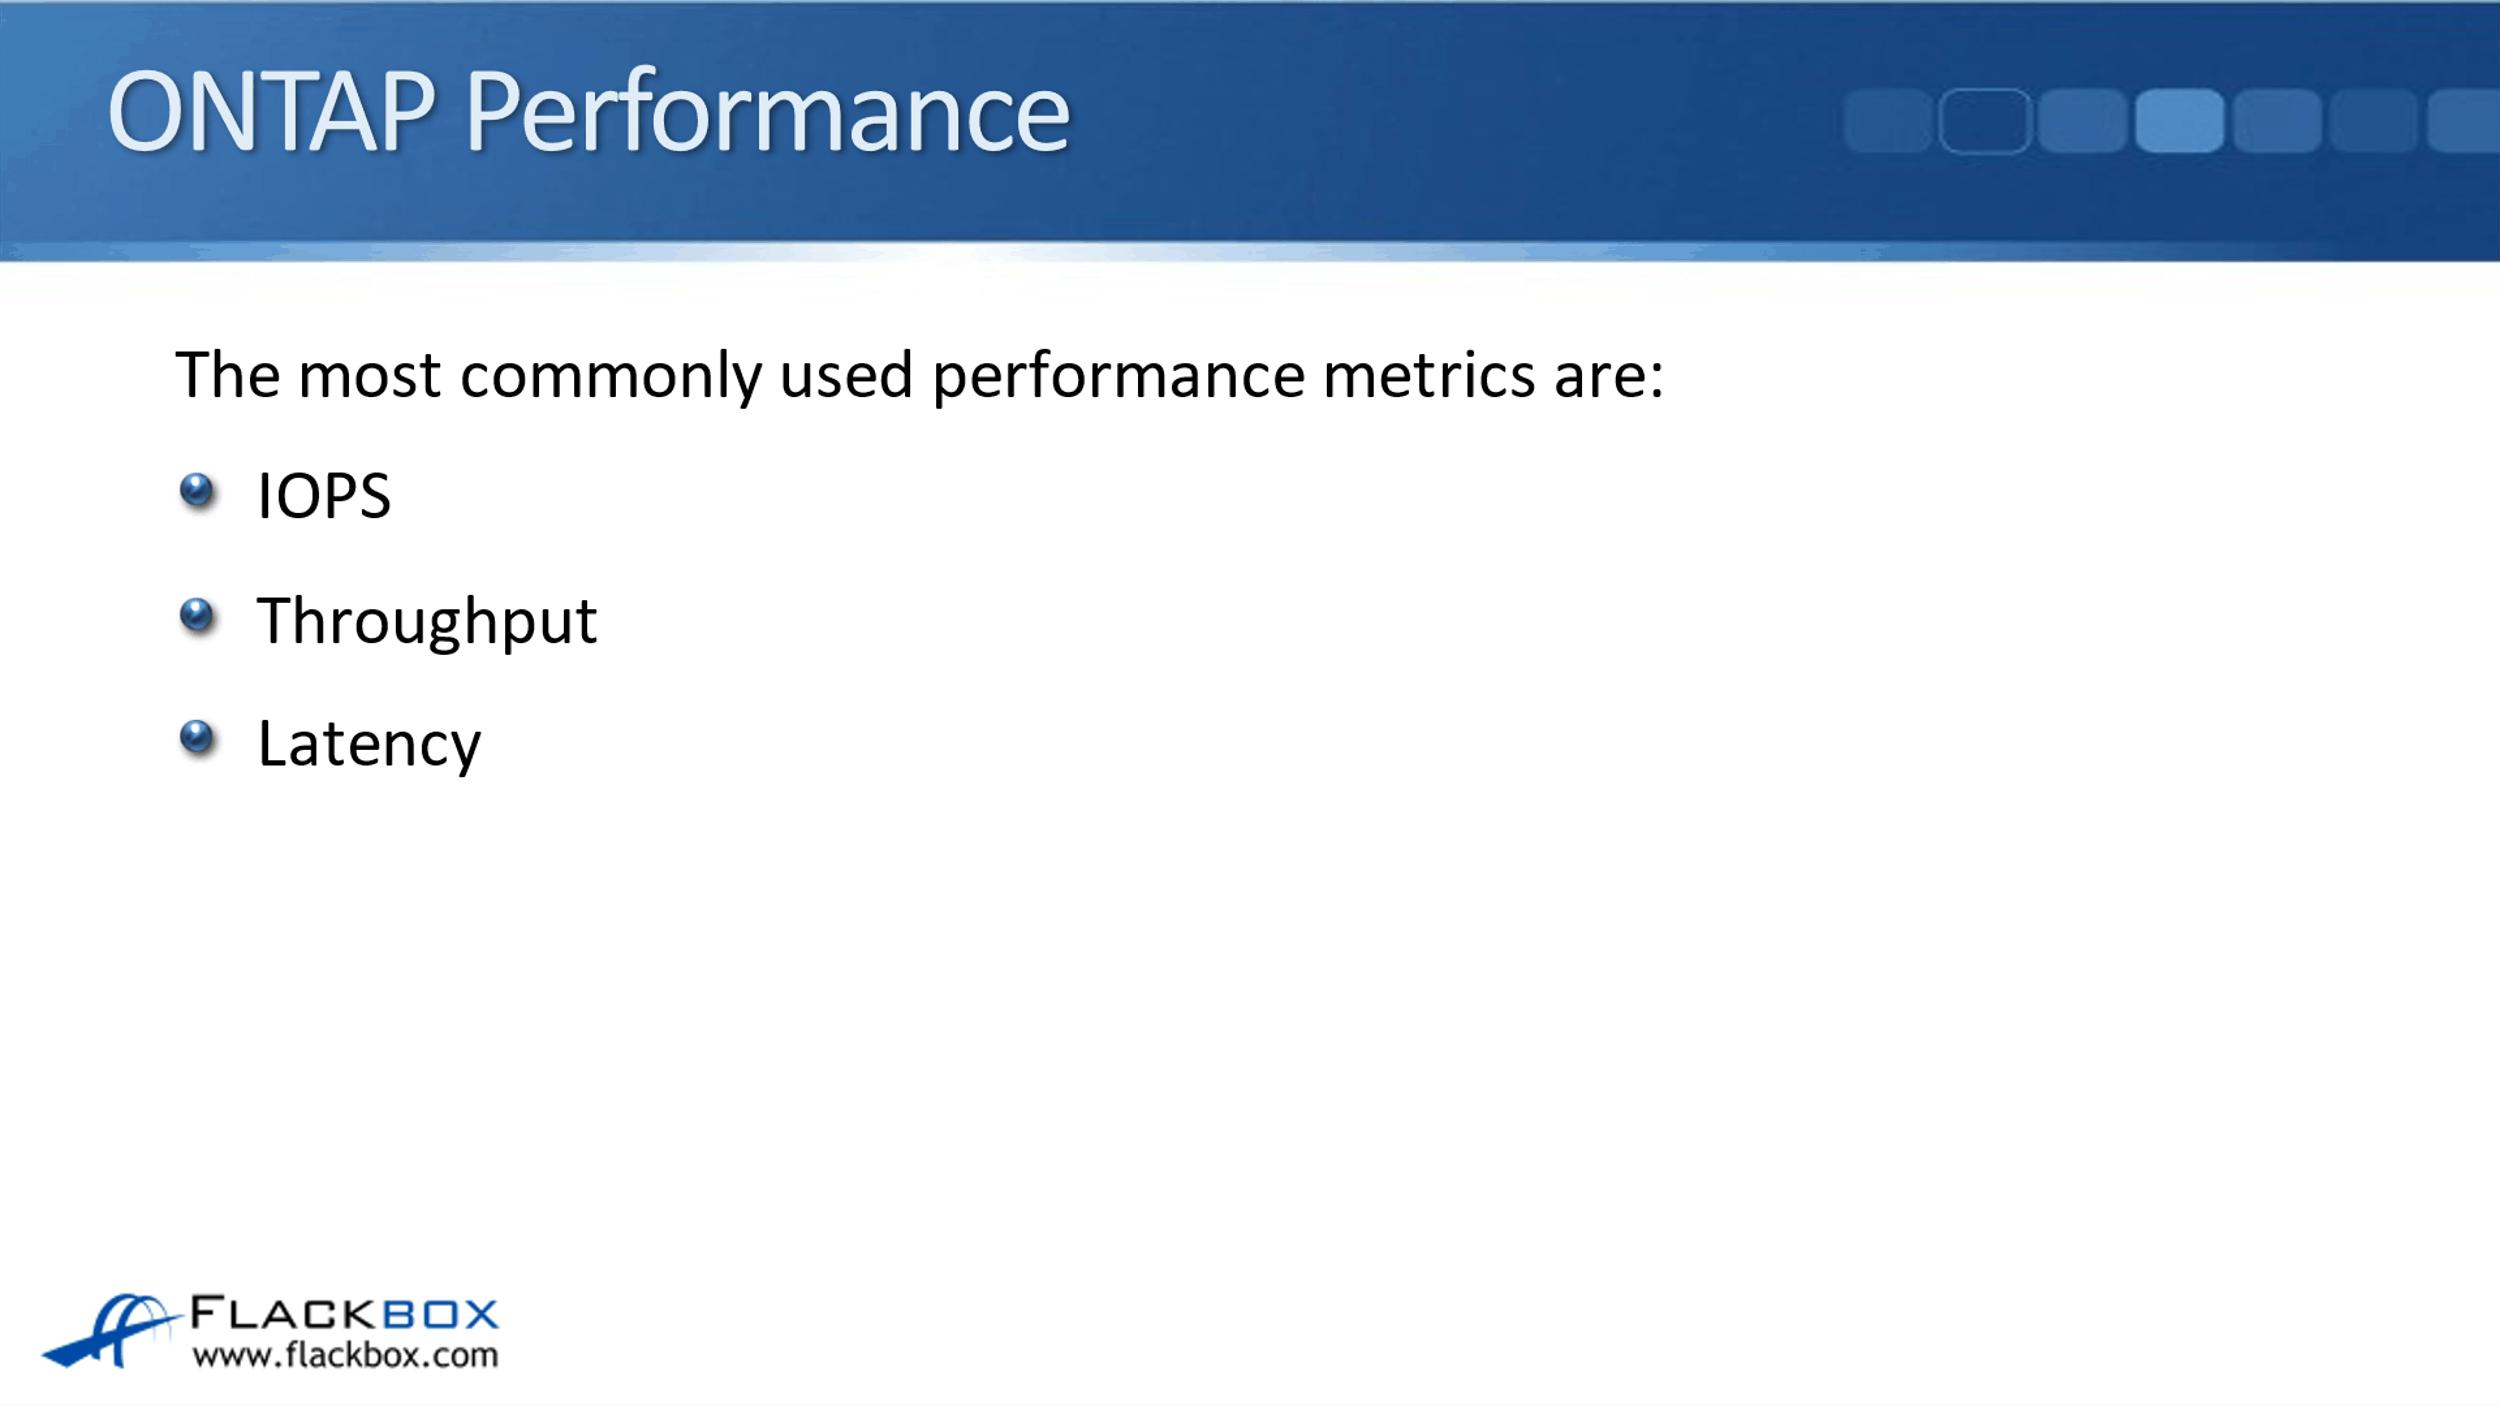 NetApp ONTAP Performance Overview